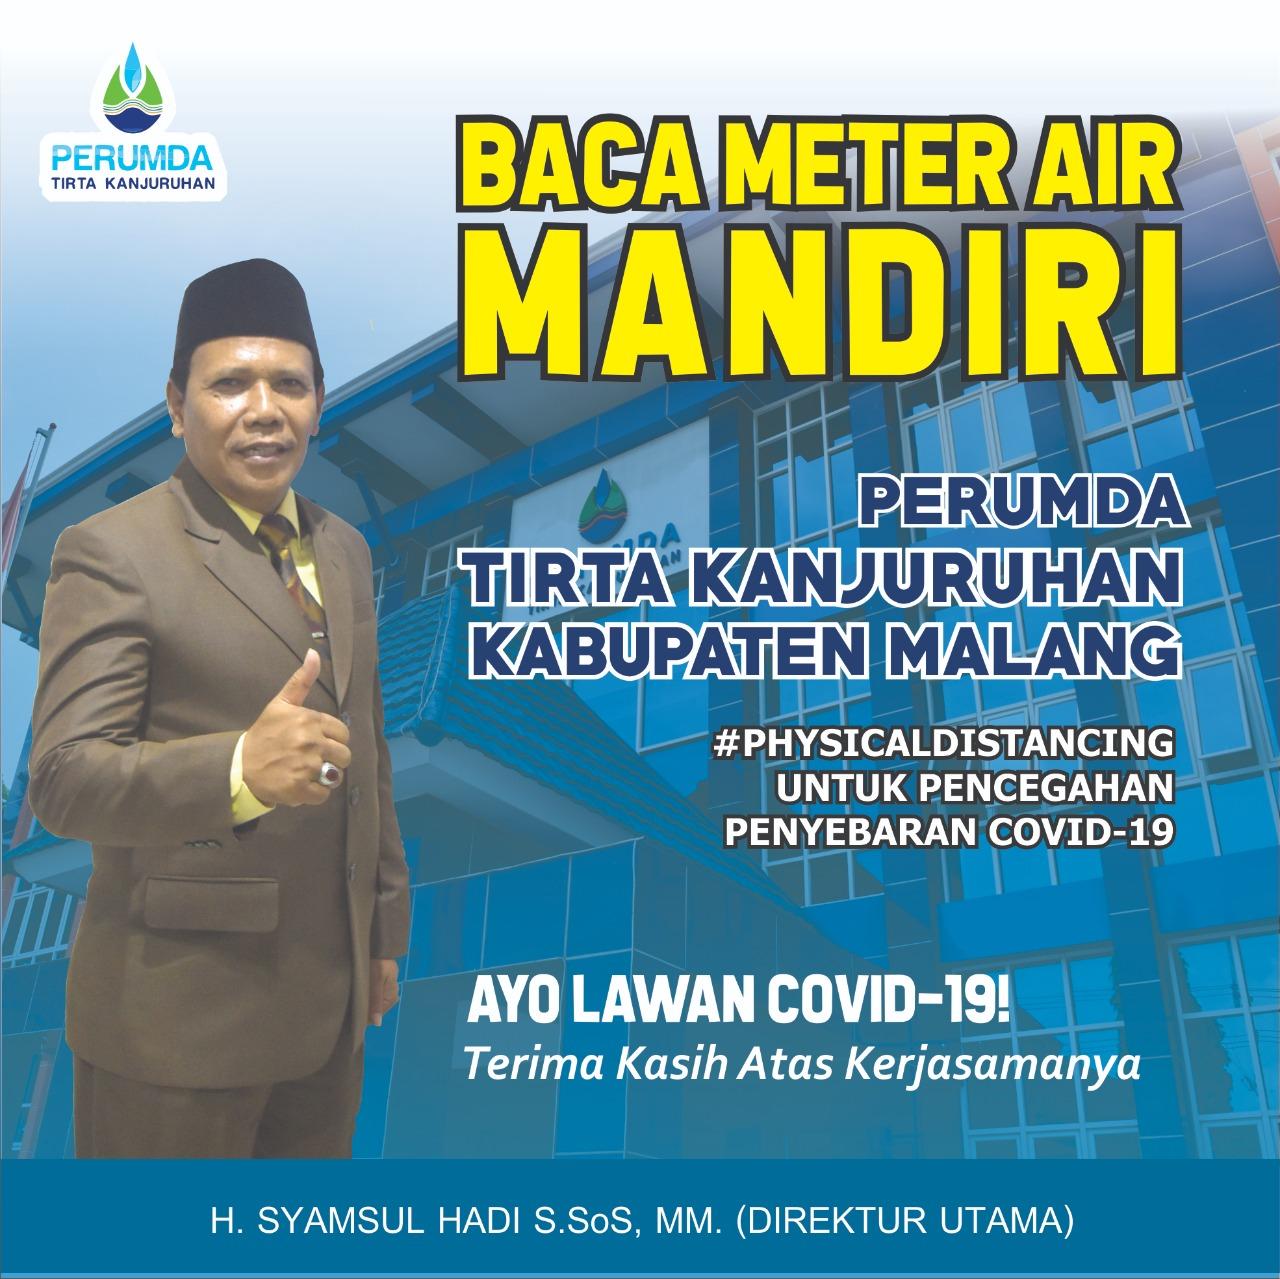 Cegah Covid-19, Perumda Tirta Kanjuruhan Terapkan Program Baca Meter Air Secara Mandiri